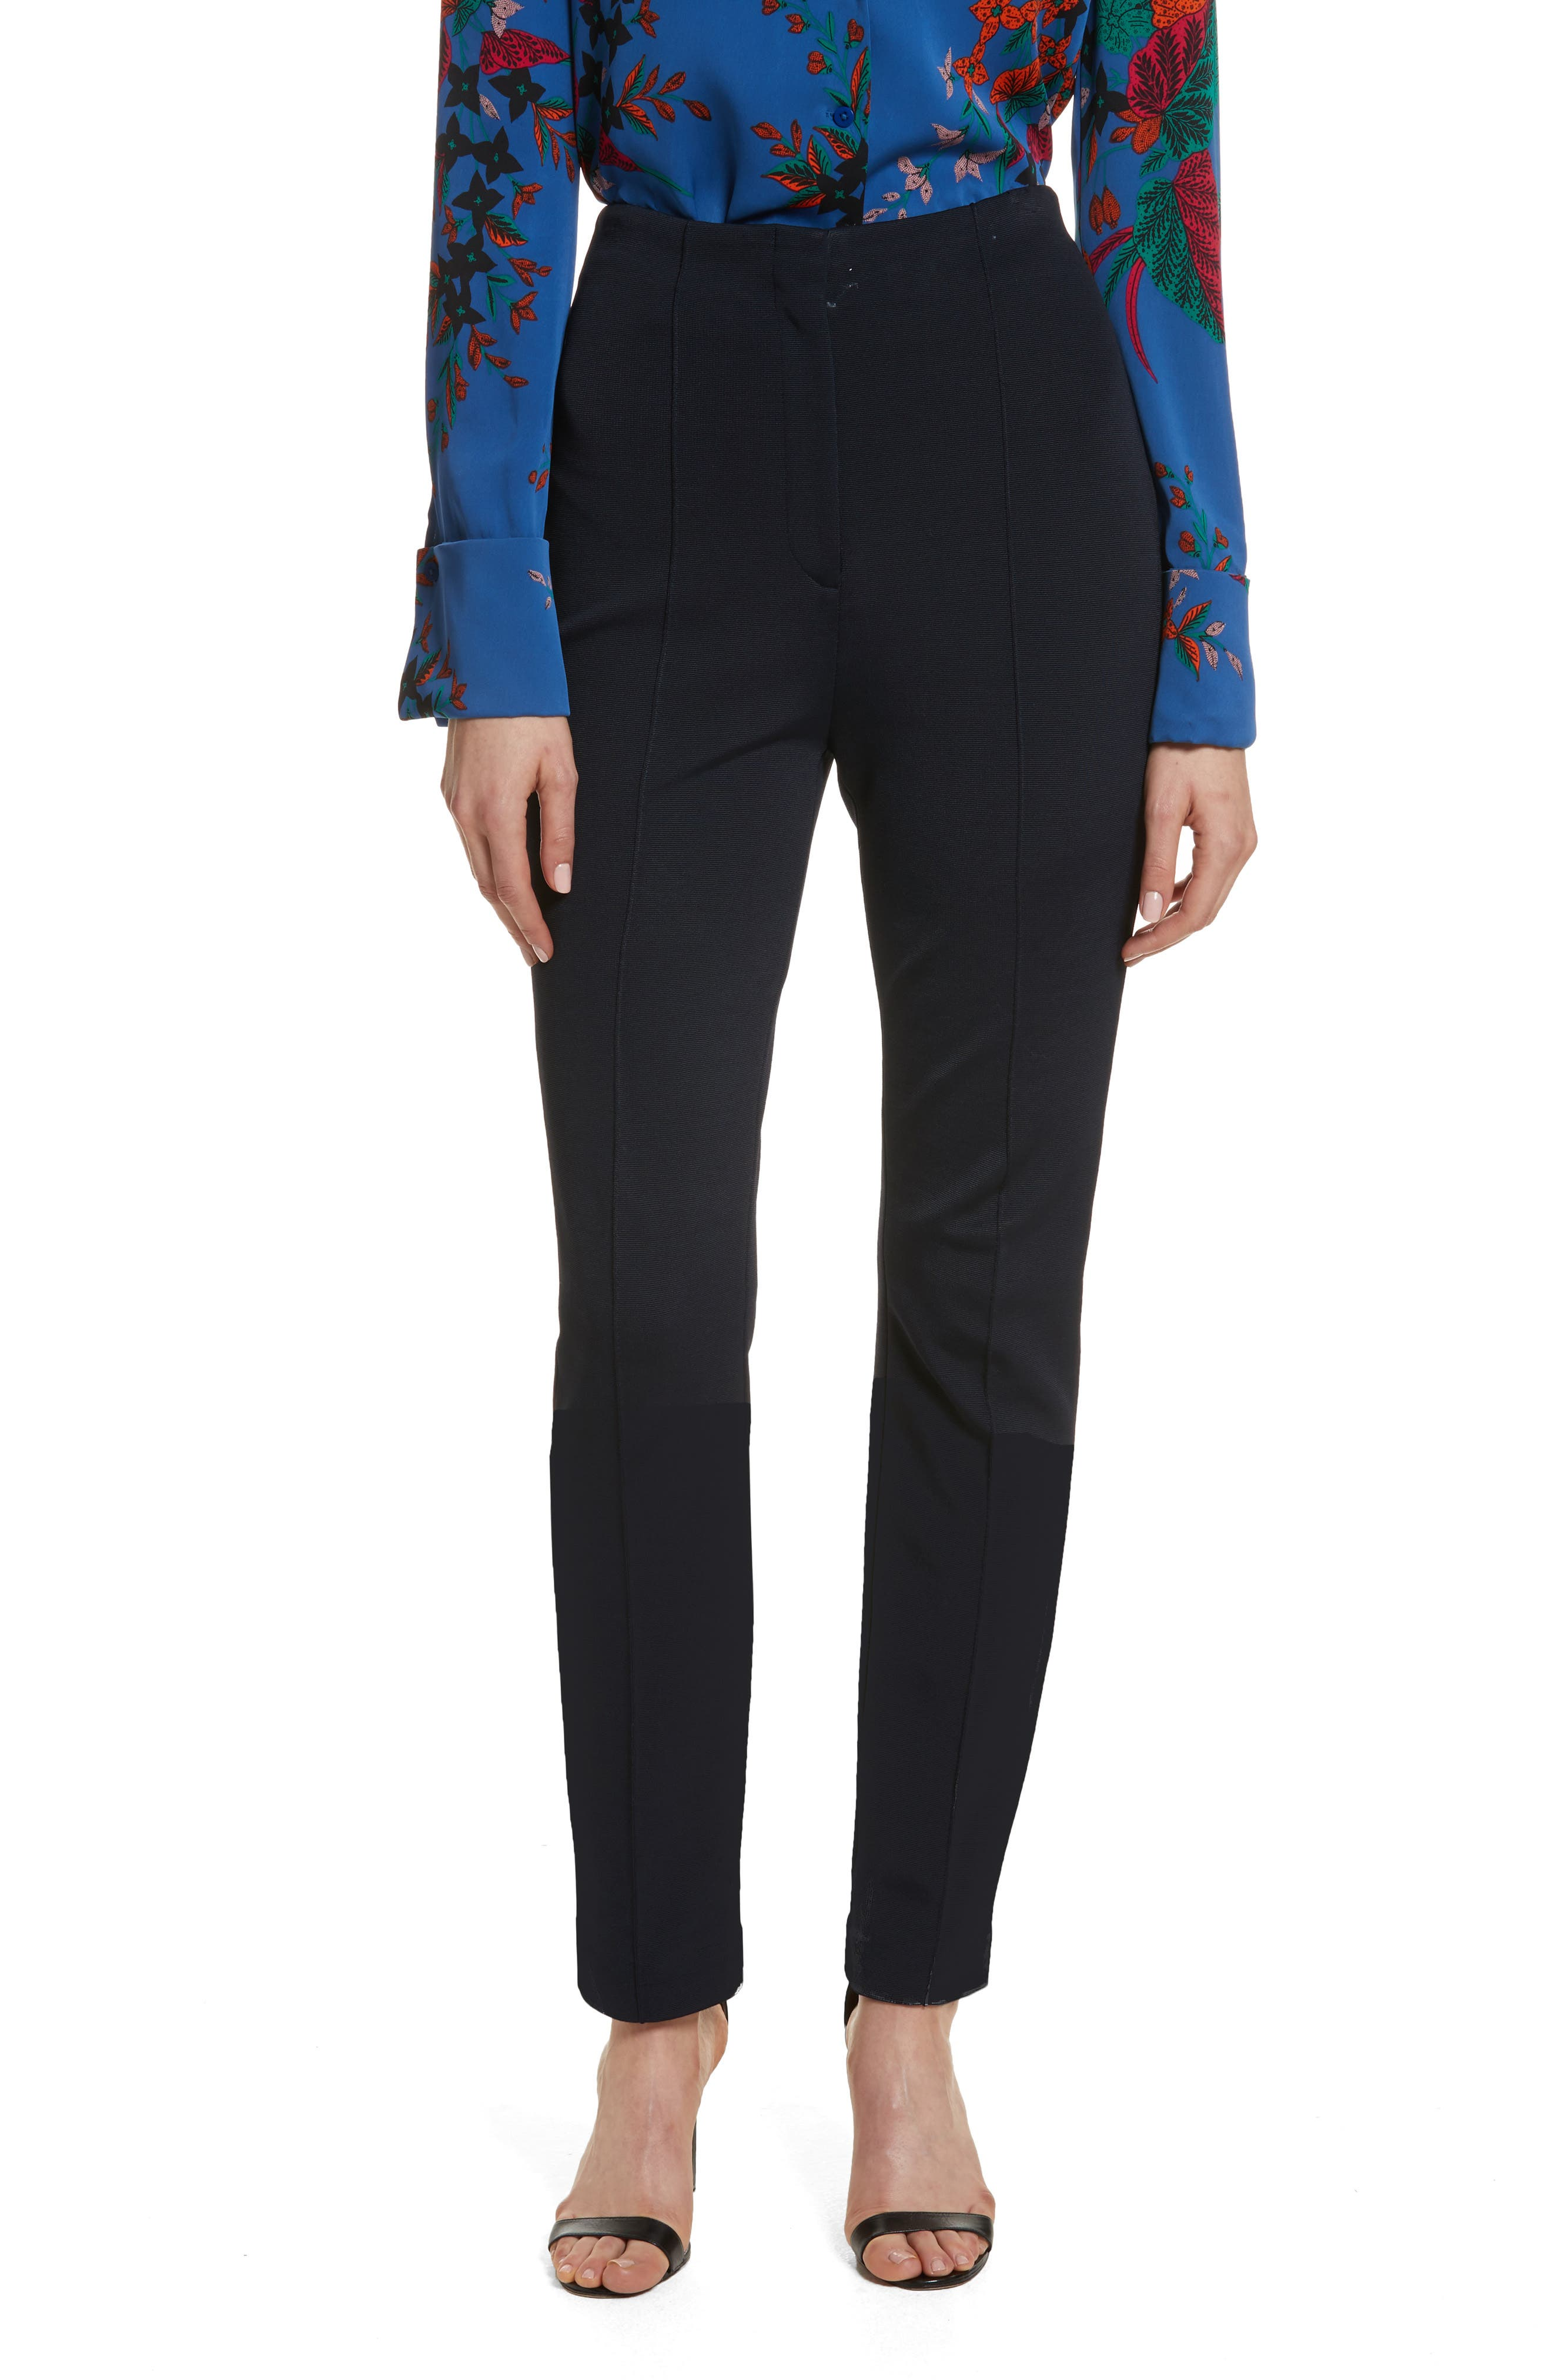 Diane von Furstenberg High Waist Skinny Pants,                             Main thumbnail 1, color,                             403